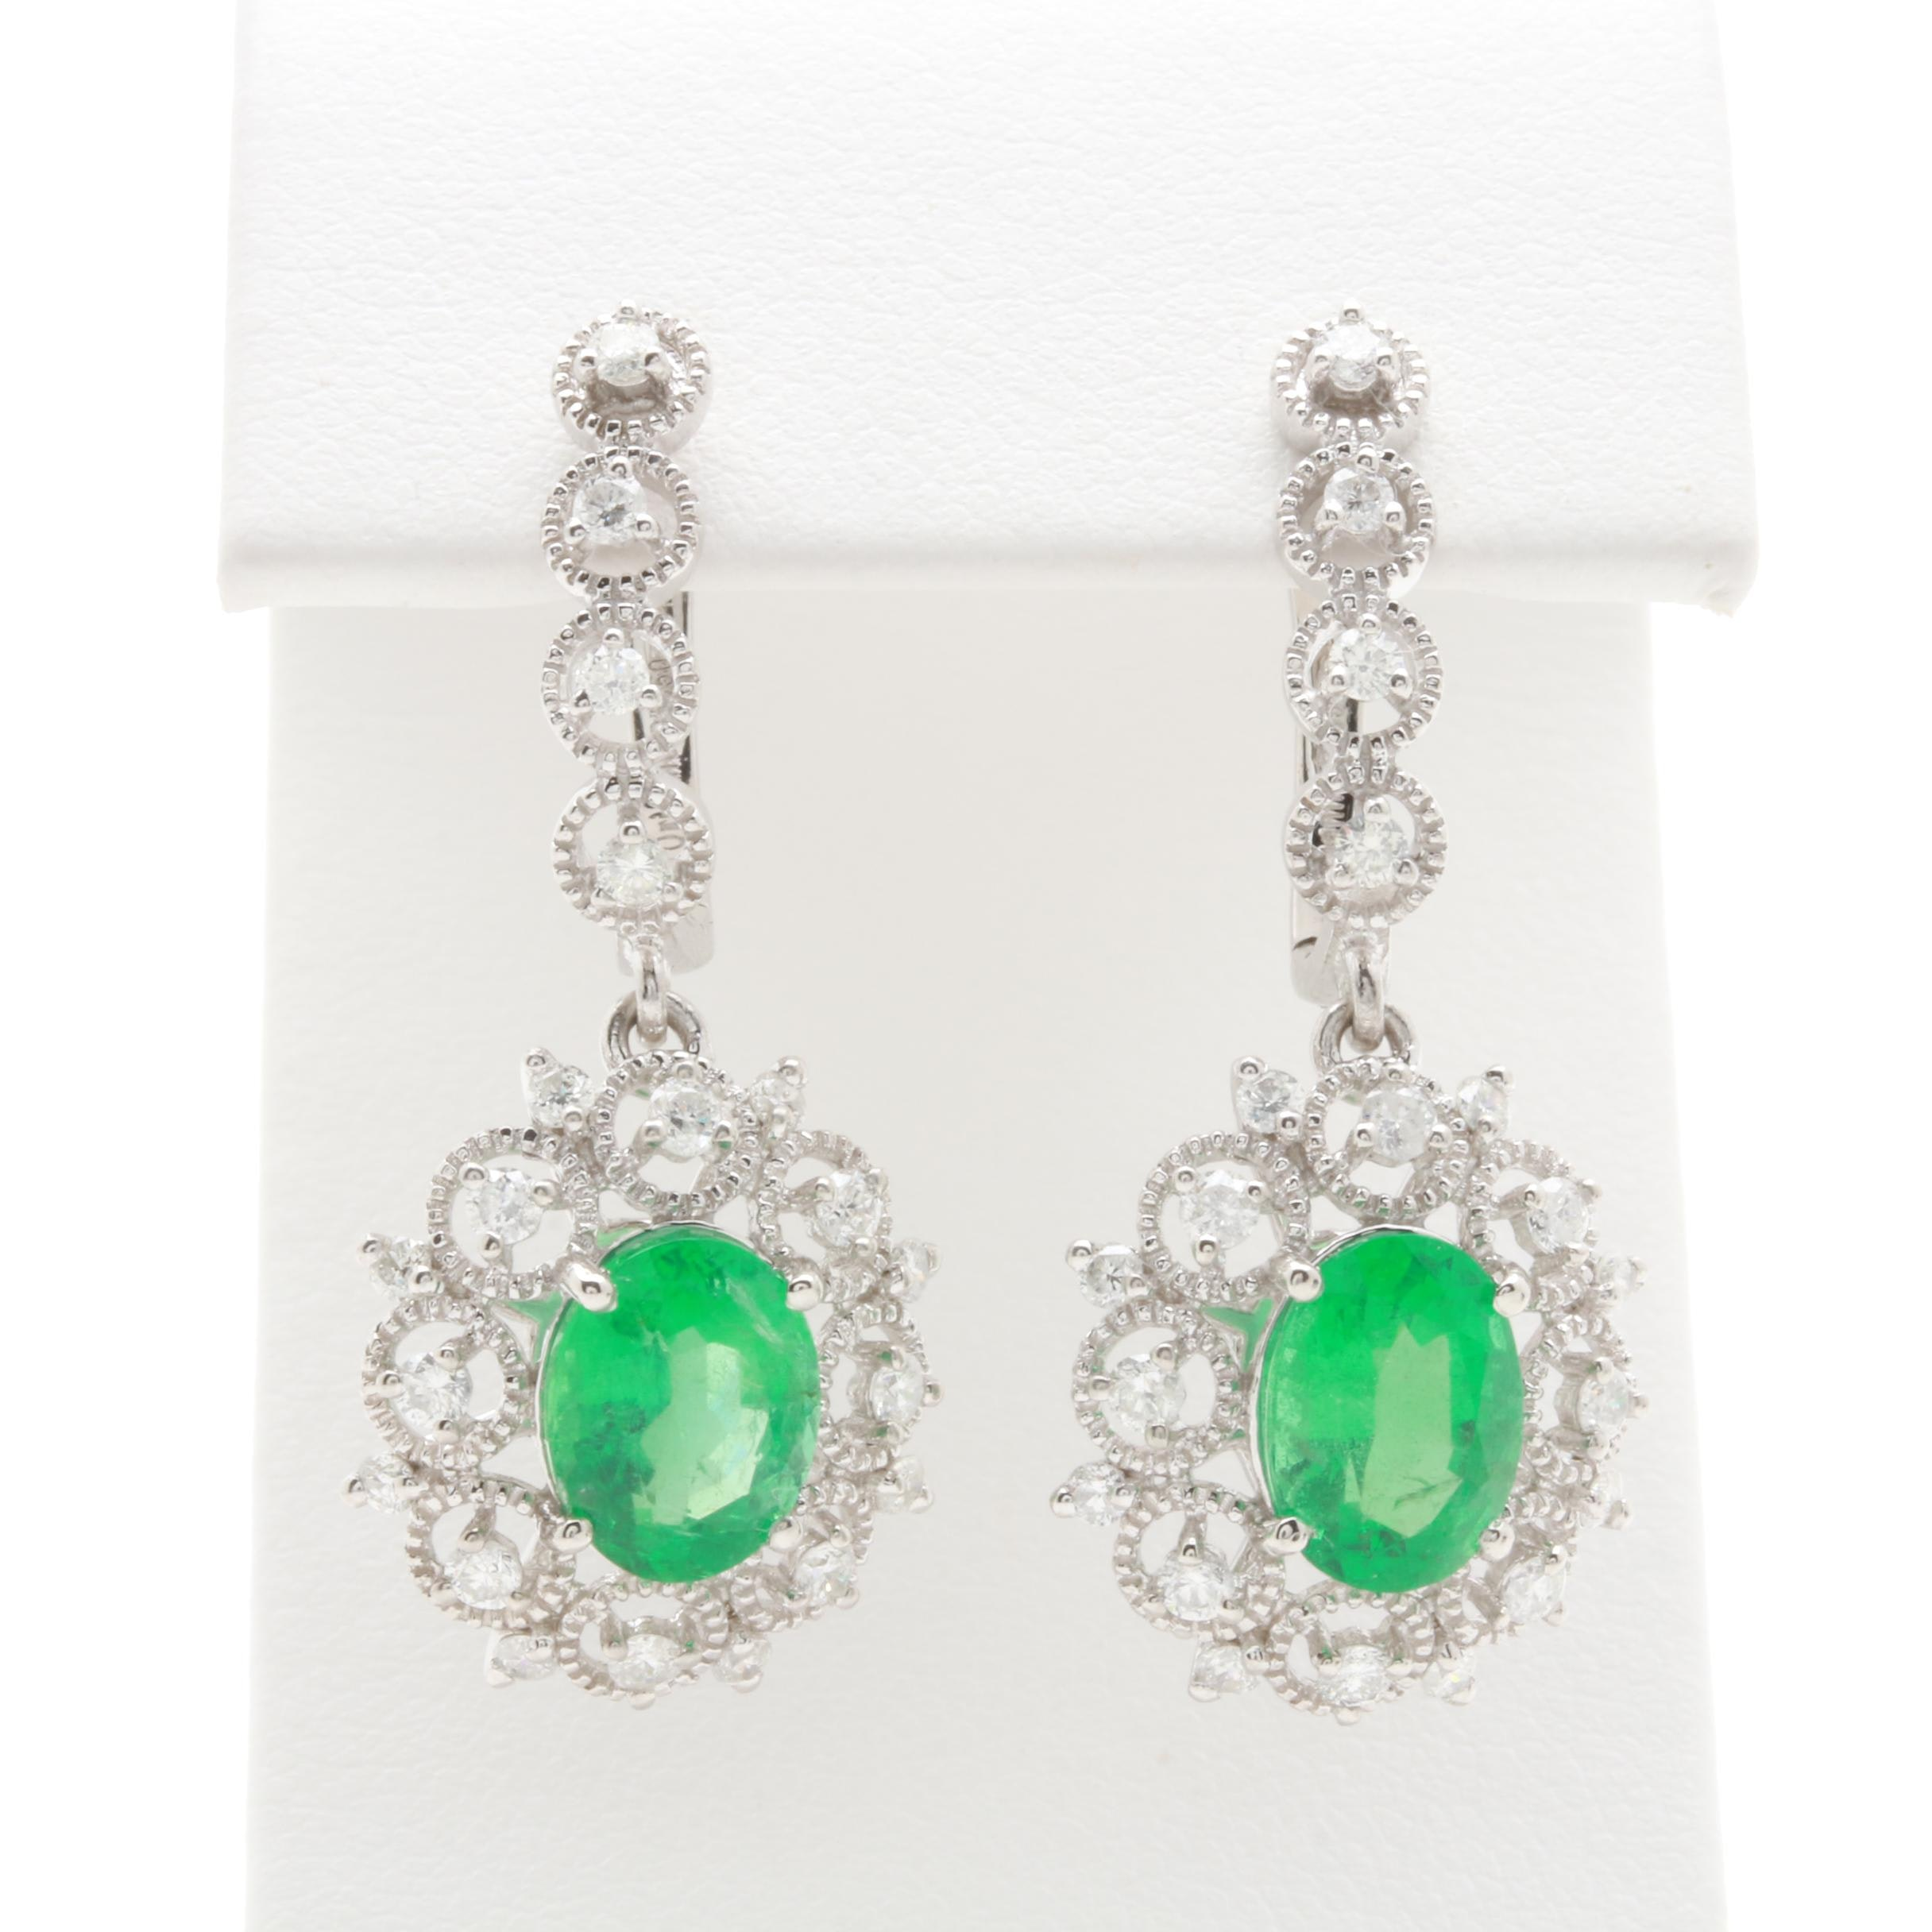 Platinum 3.36 CTW Emerald and 1.00 CTW Diamond Earrings